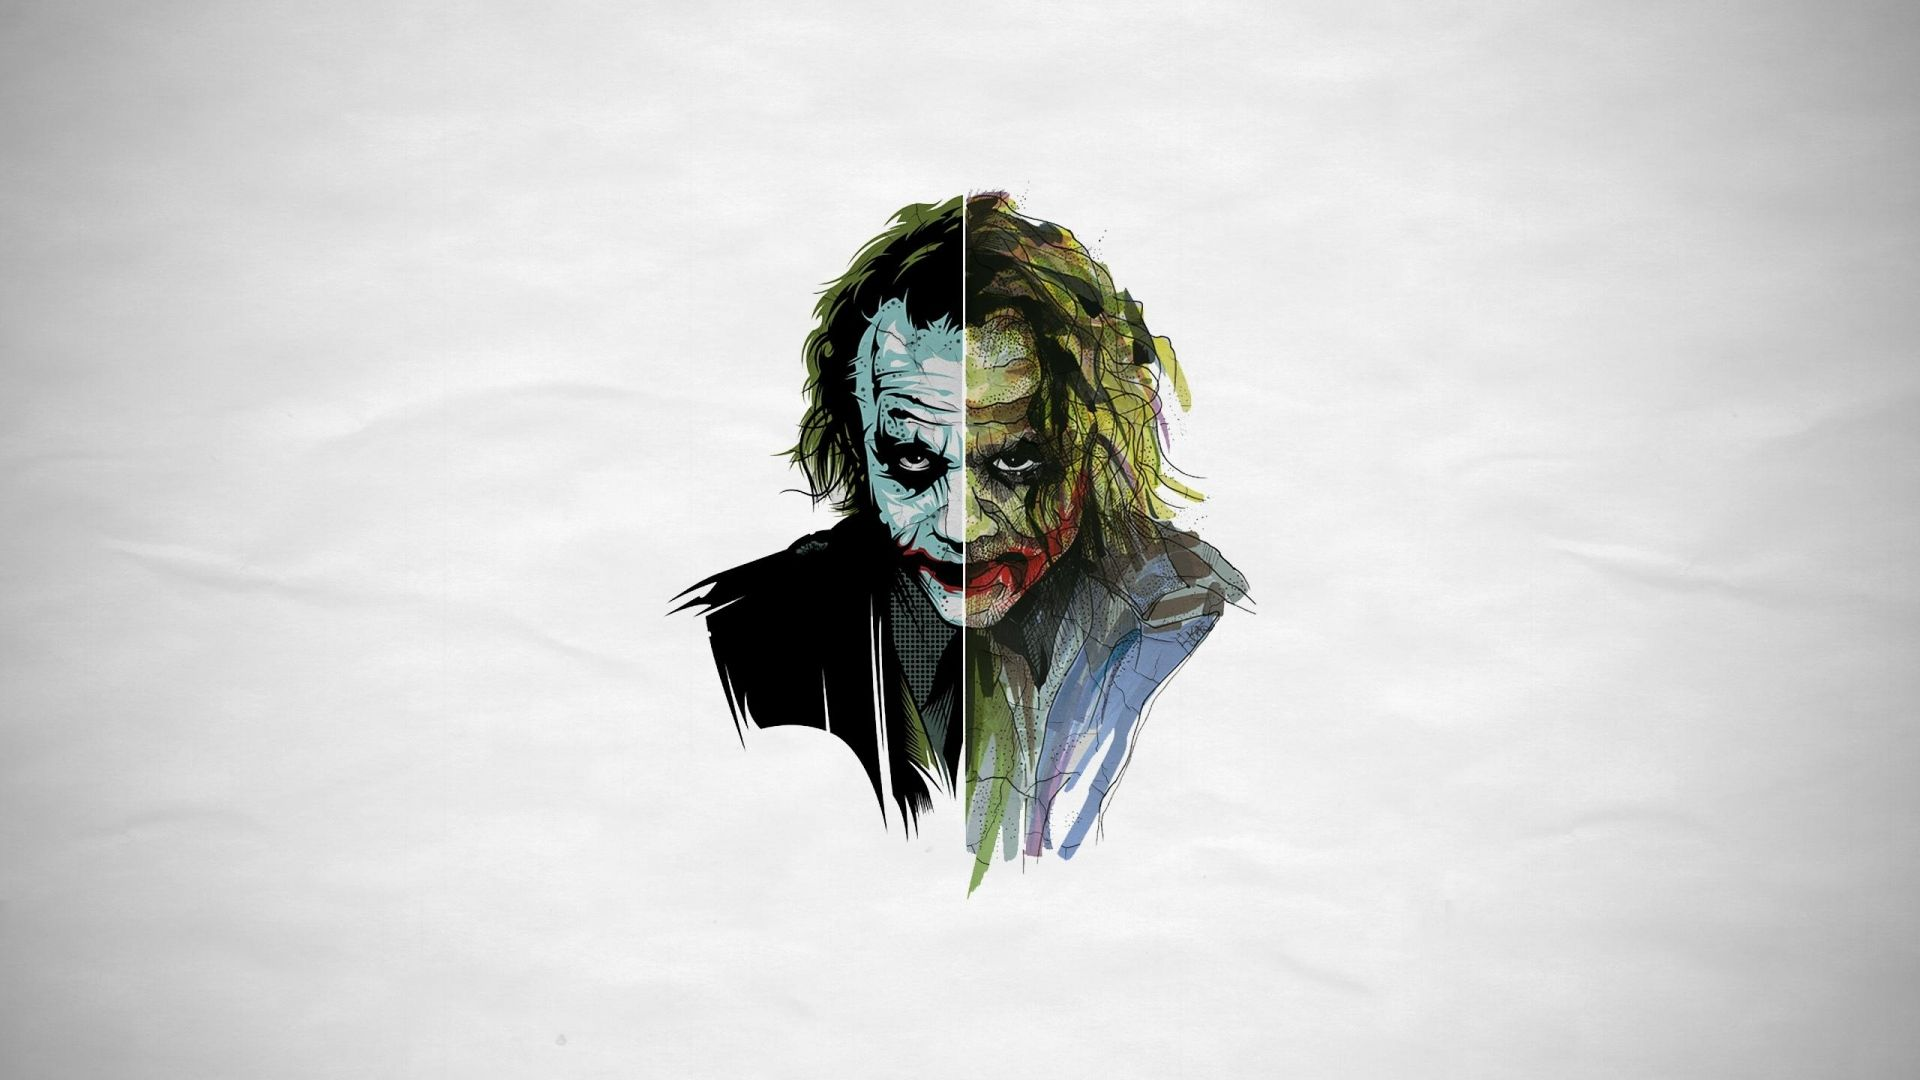 Full Hd 1080p Joker Wallpapers Hd Desktop Backgrounds